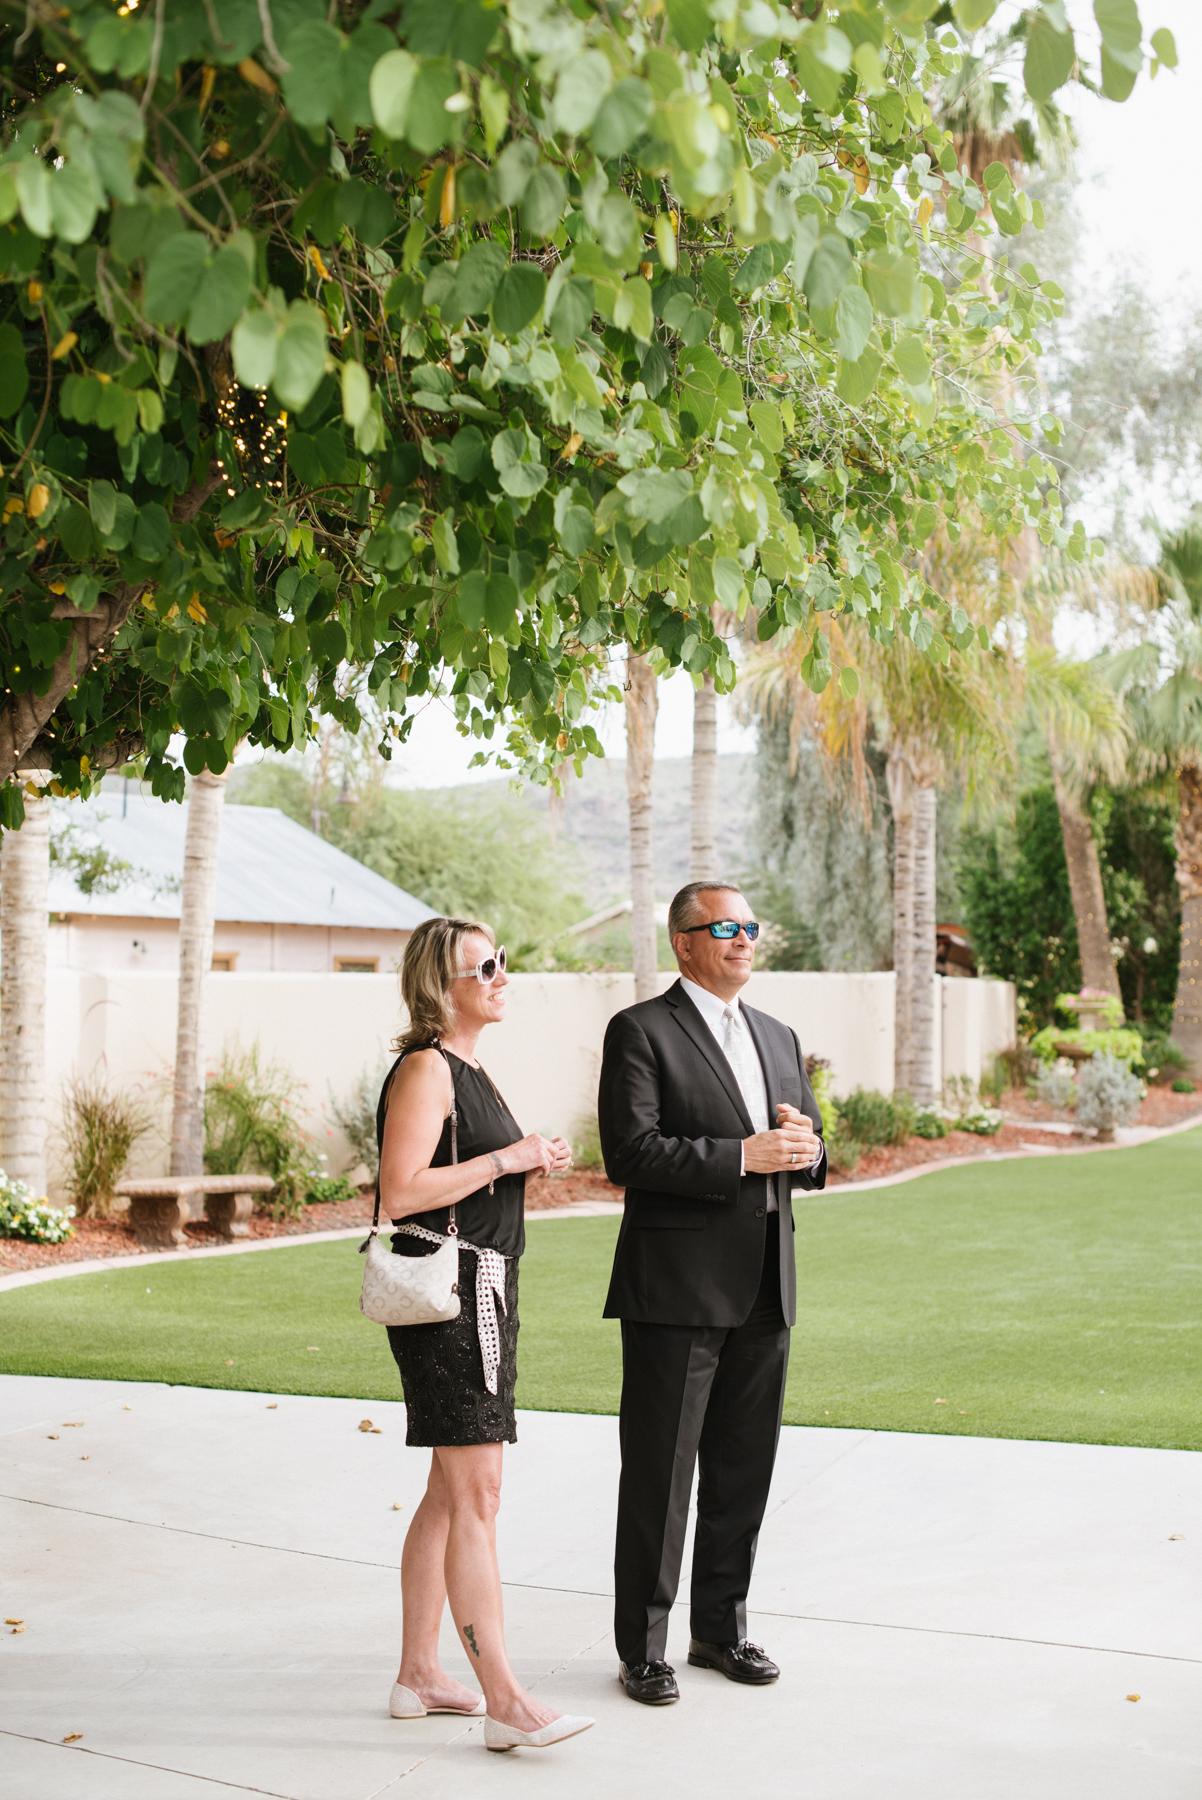 Secret Garden Event Center Wedding - Meredith Amadee Photography-76.jpg